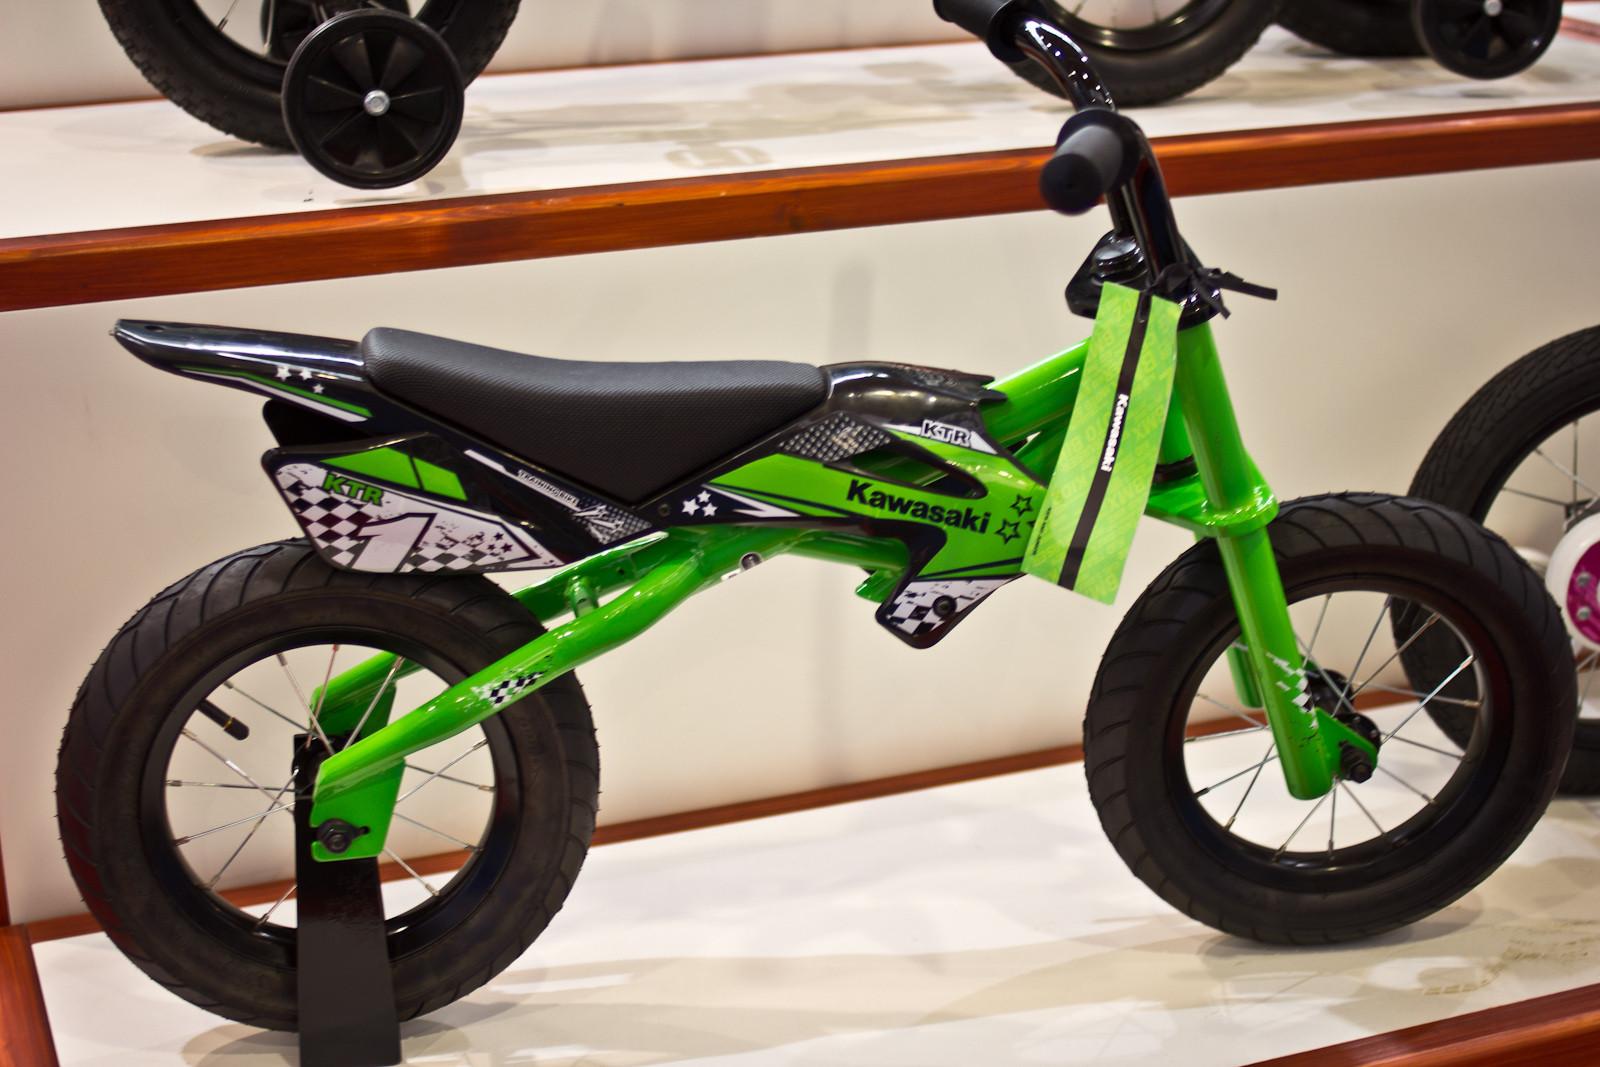 KTR Kawasaki Push Bike - 2014 Kids Bikes at Eurobike 2013 - Mountain Biking Pictures - Vital MTB